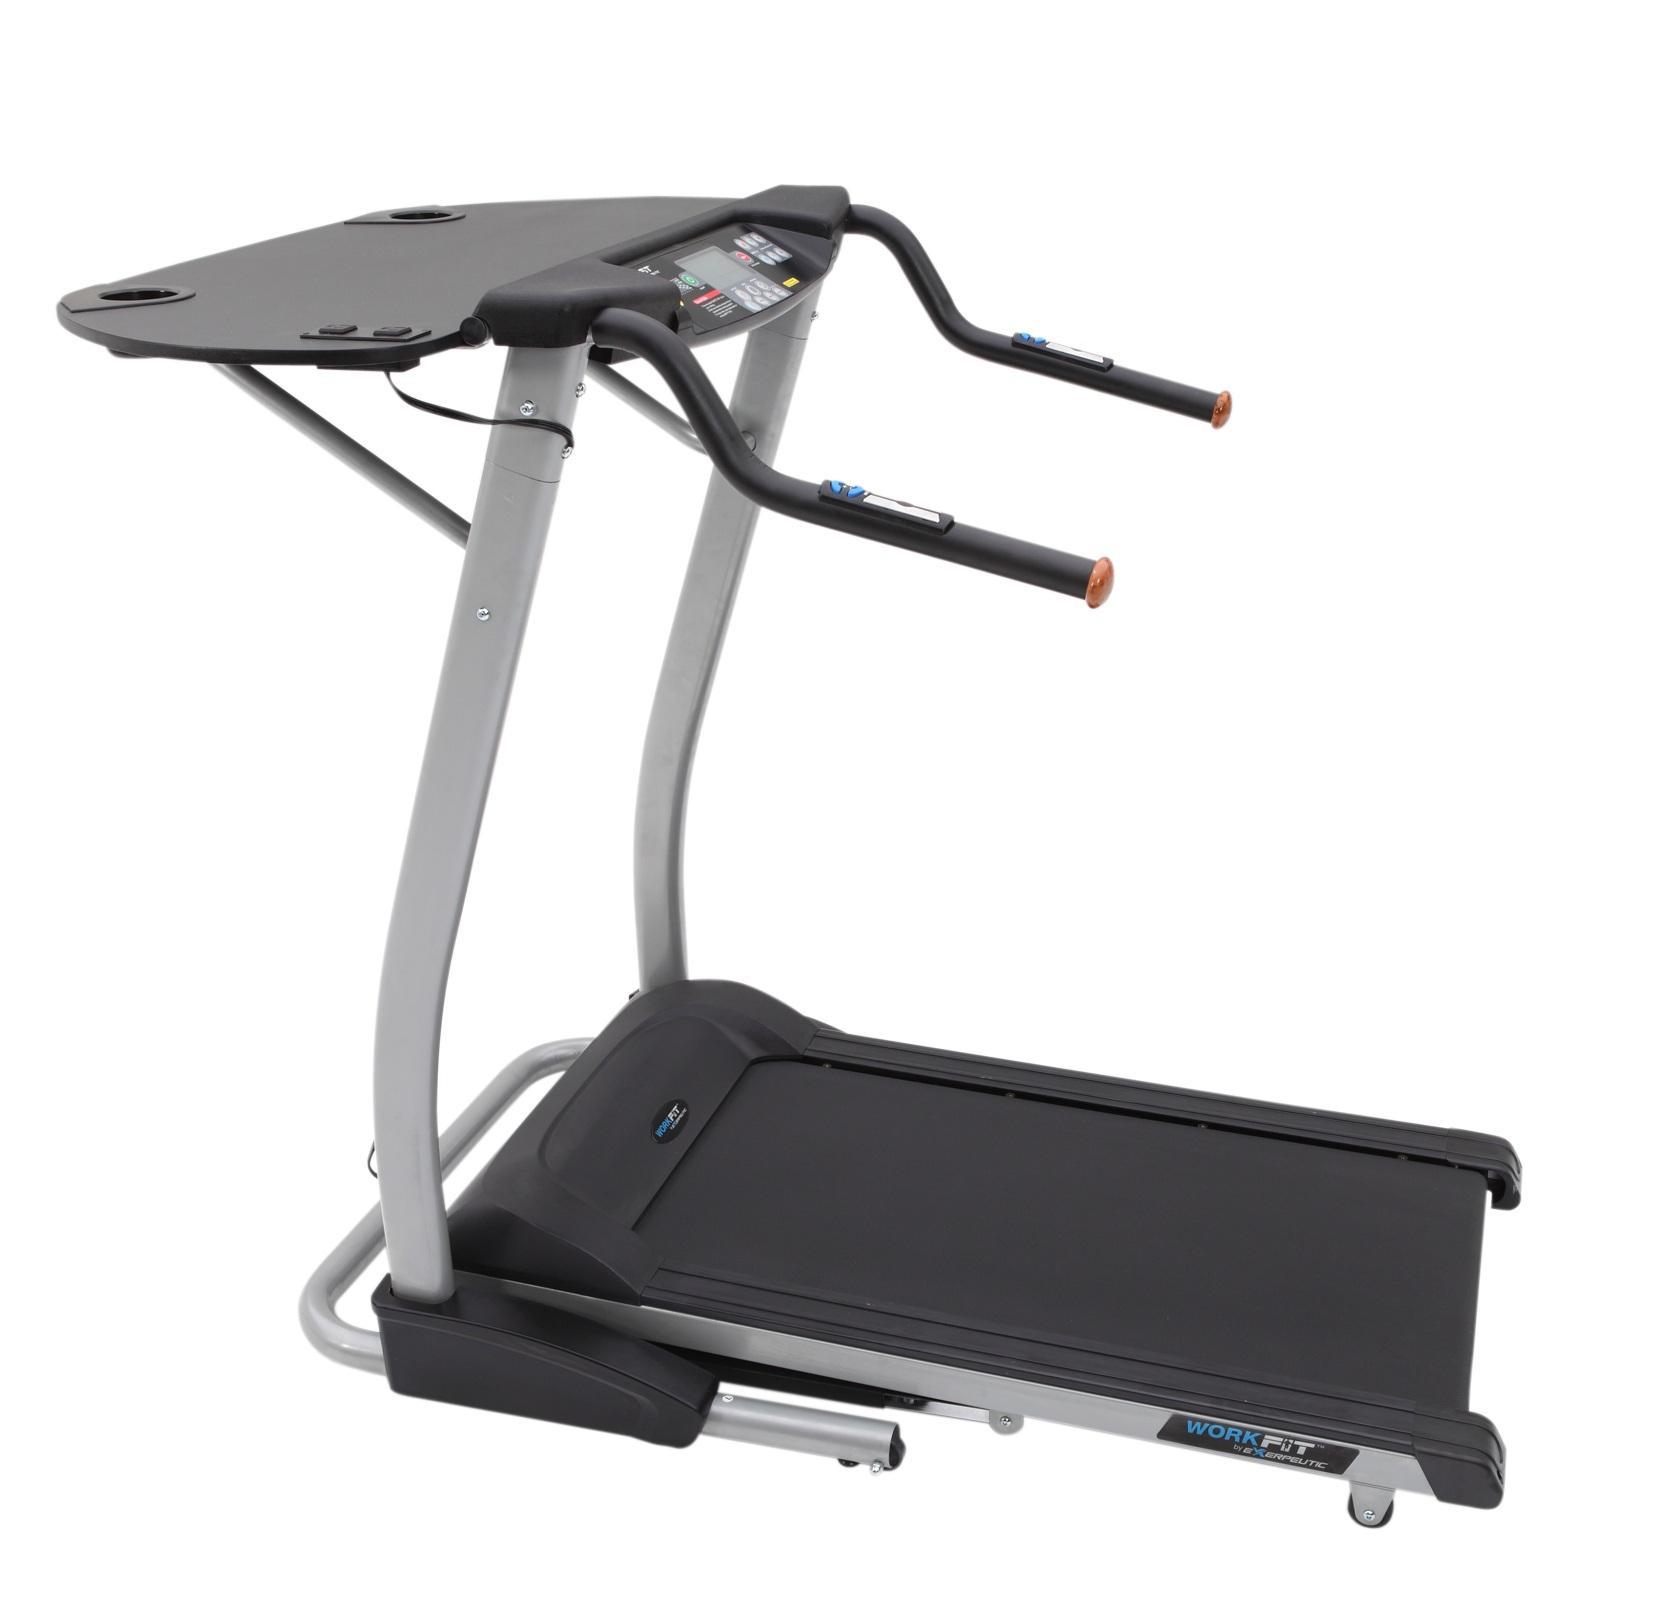 Electric Treadmill Desk: Amazon.com : Exerpeutic 2000 WorkFit High Capacity Desk